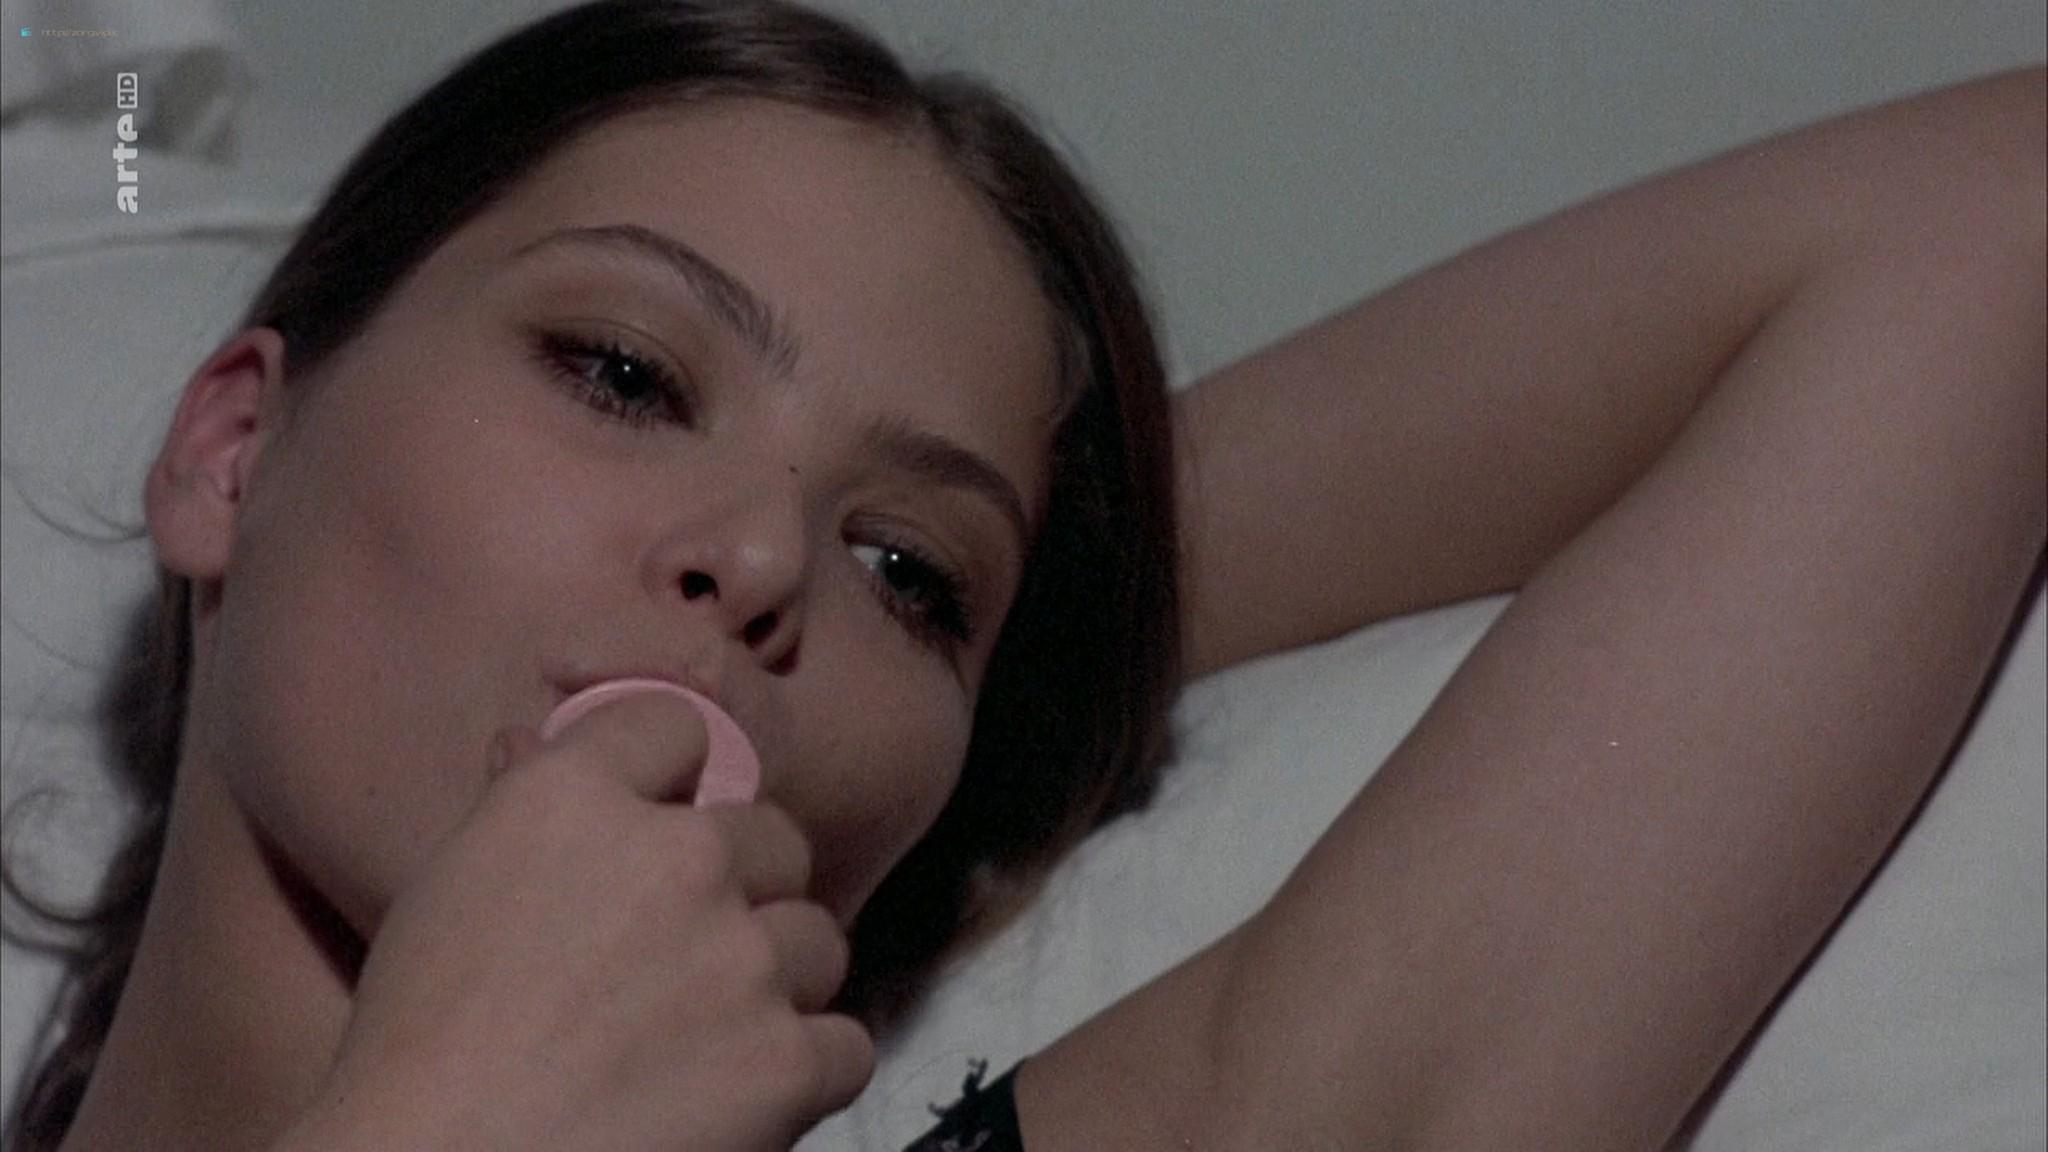 Ornella Muti nude full frontal - La dernière femme (1976) HDTV 1080p (11)